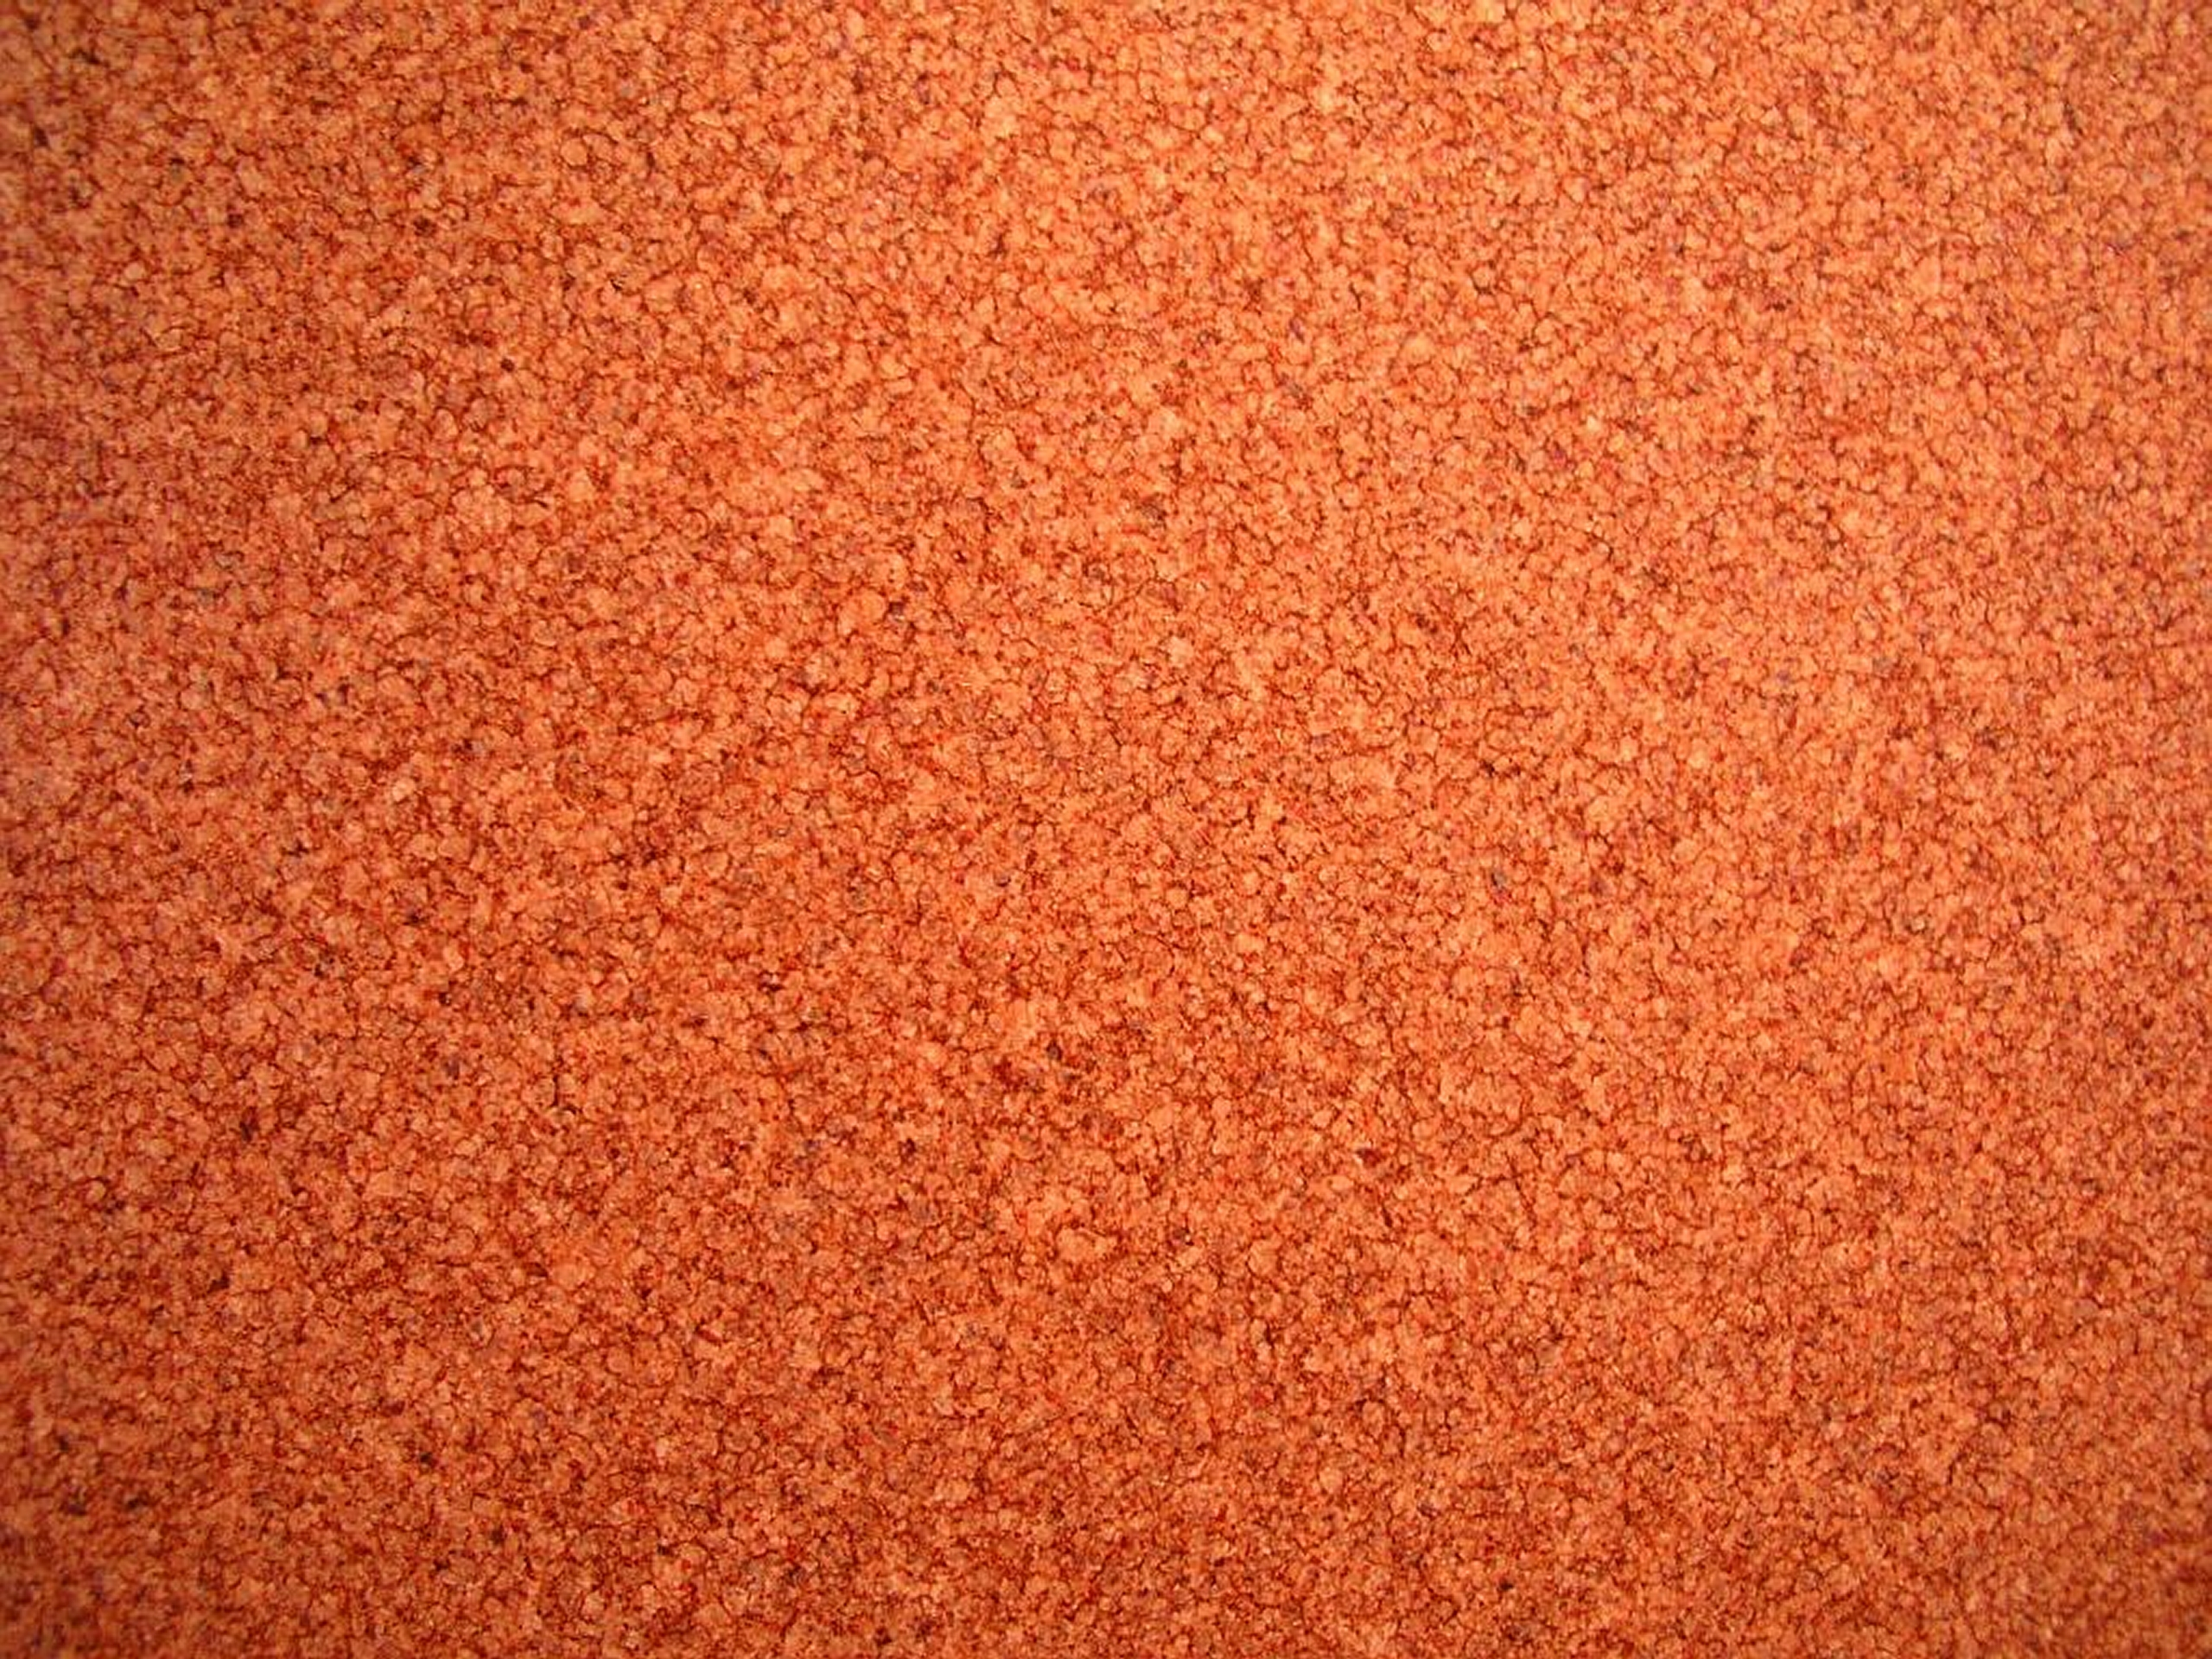 high quality dark orange linoleum flooring textures